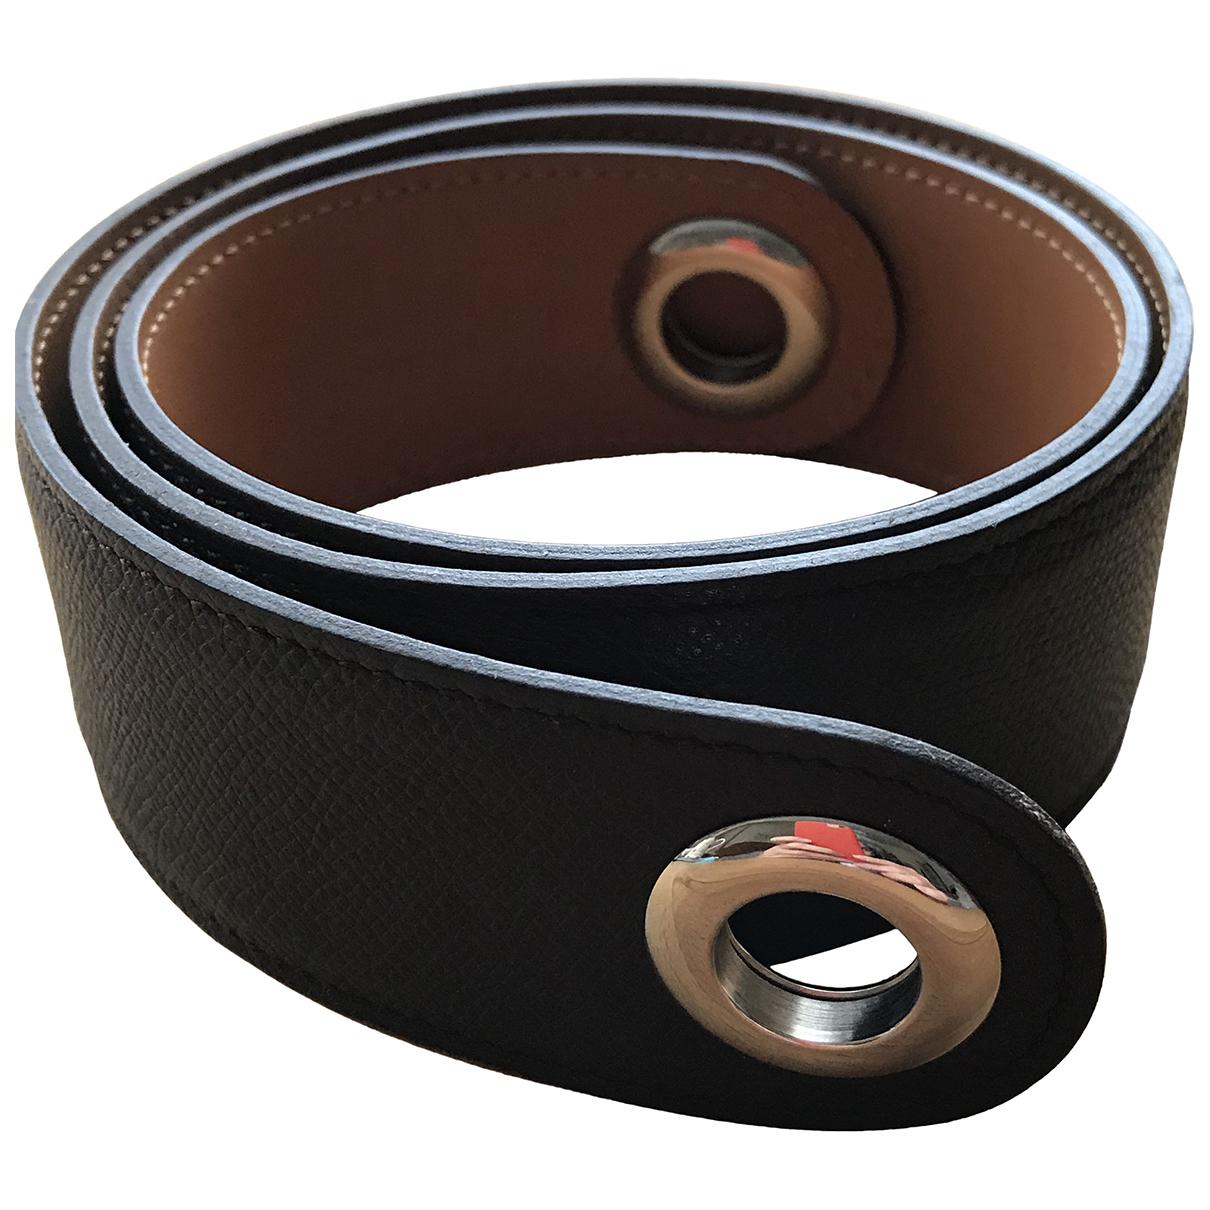 Hermès \N Brown Leather belt for Women L International